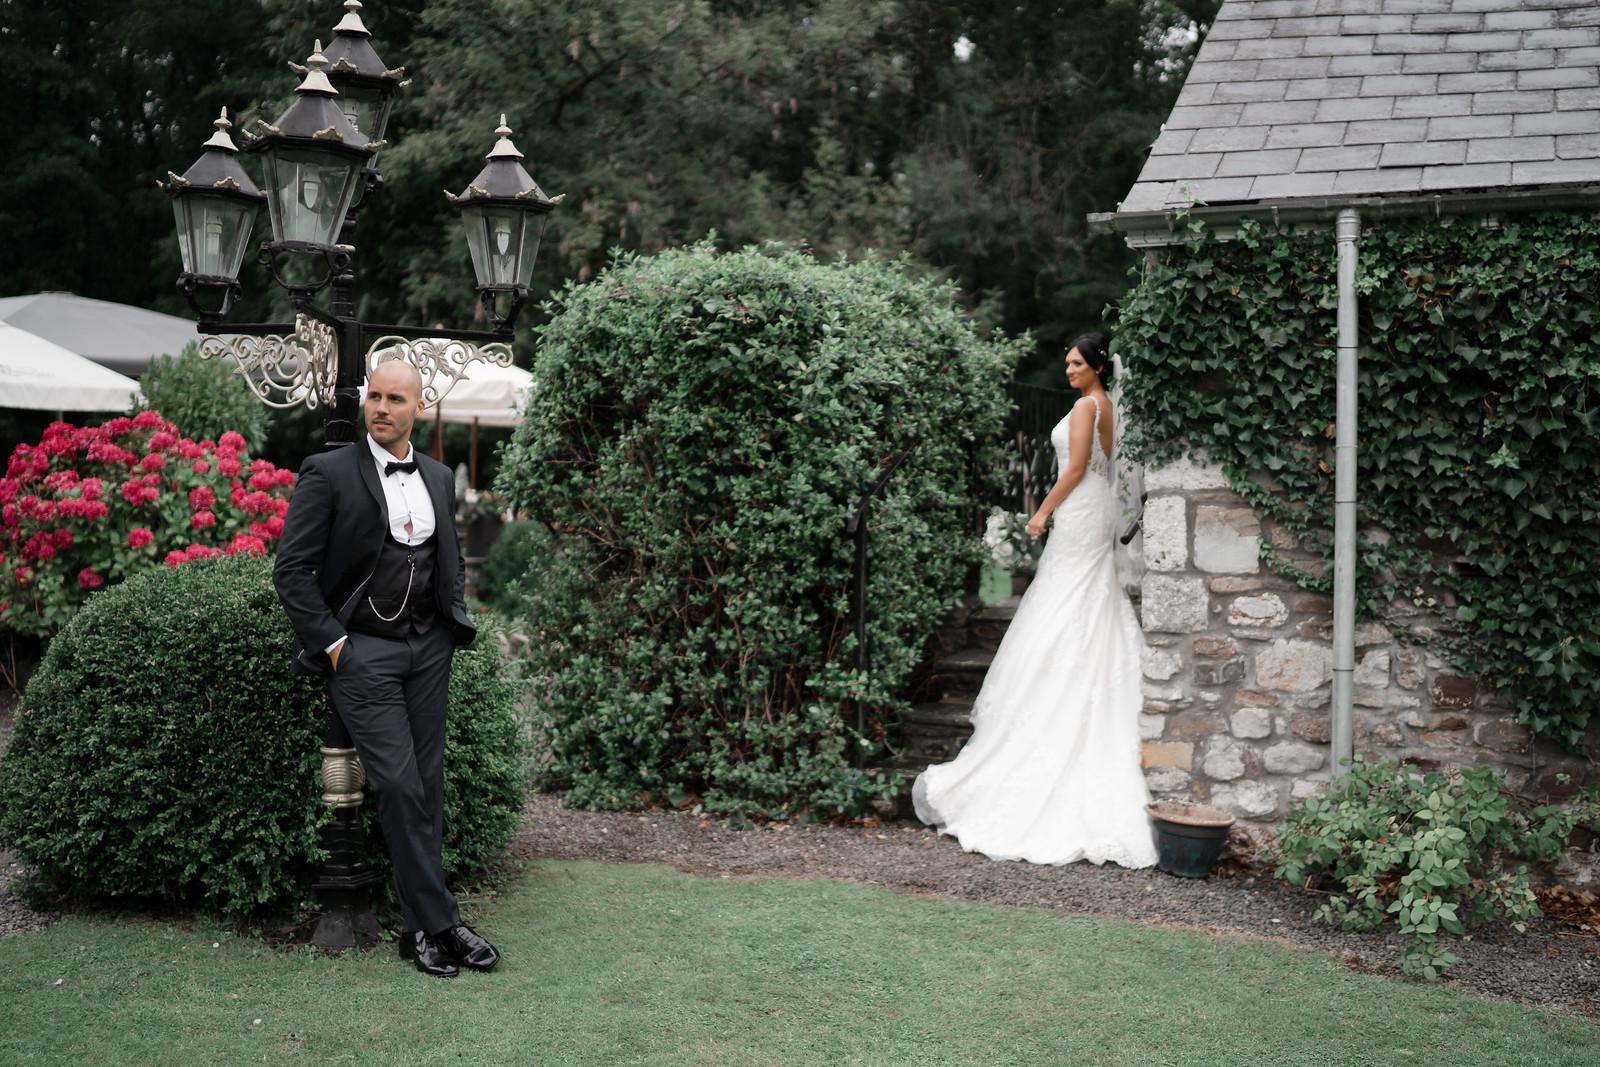 Bride and Groom Wedding Photo - Wedding Photographer Essex